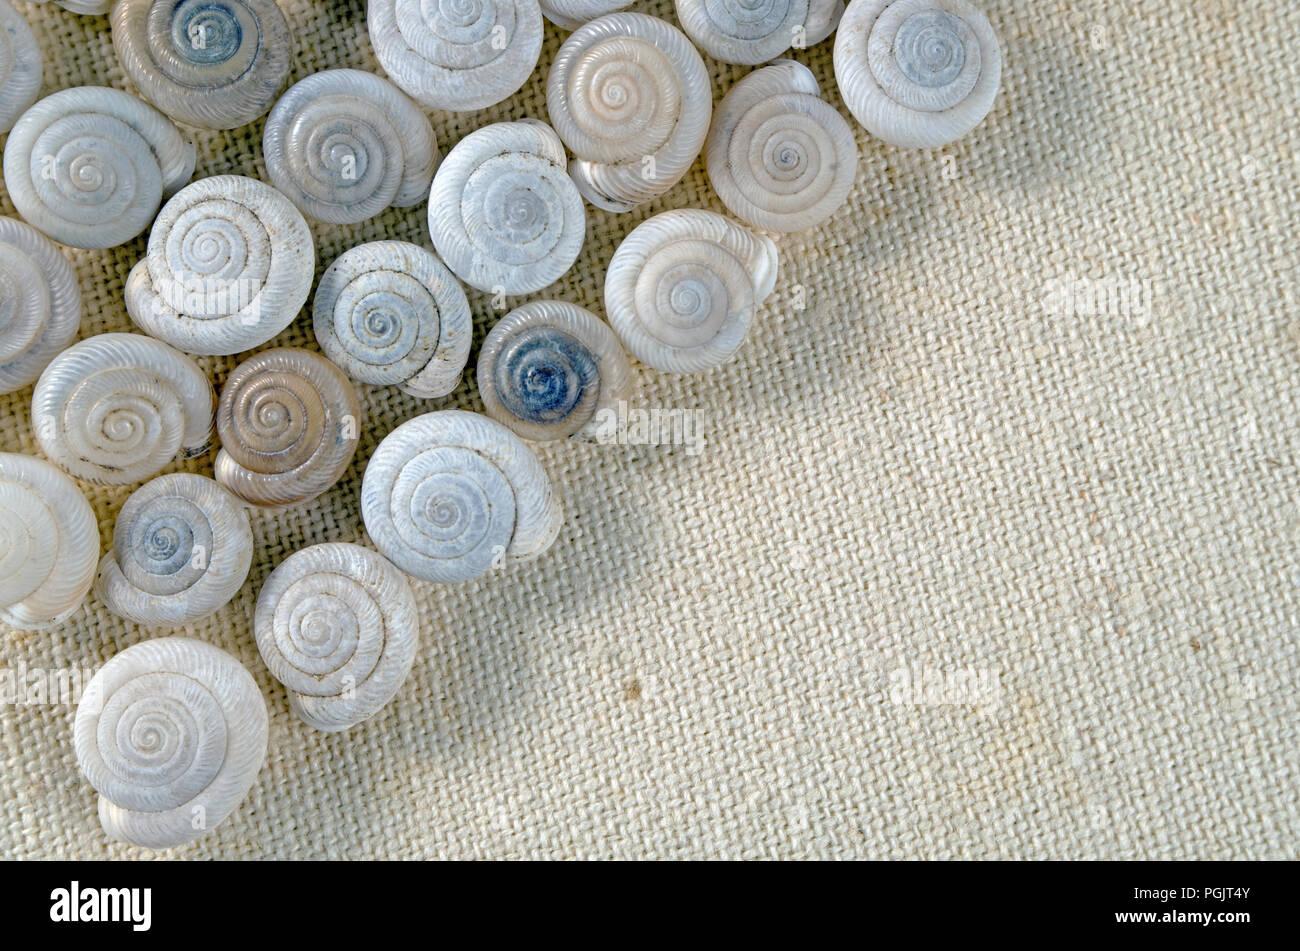 Tiny snail shell arrangement on khaki fabric, close-up/macro shot. Photo Two. - Stock Image